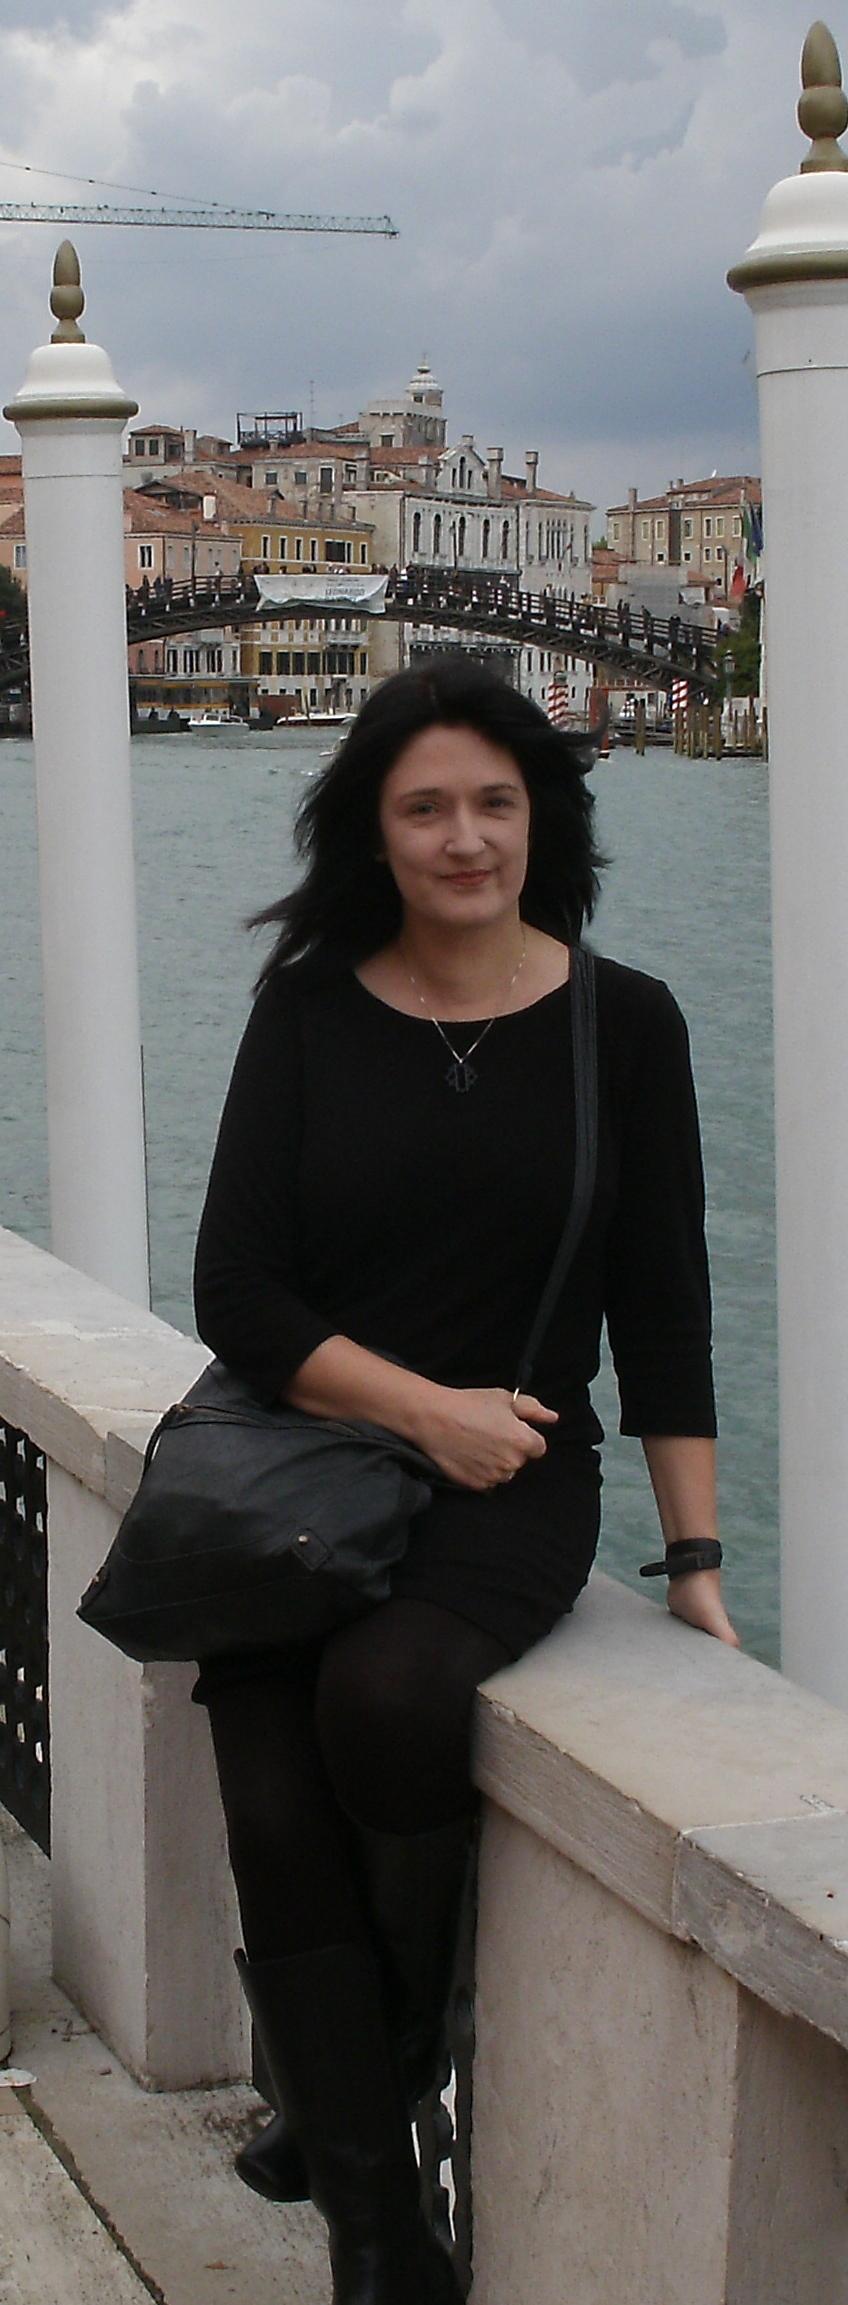 Rhona Fairgrieve